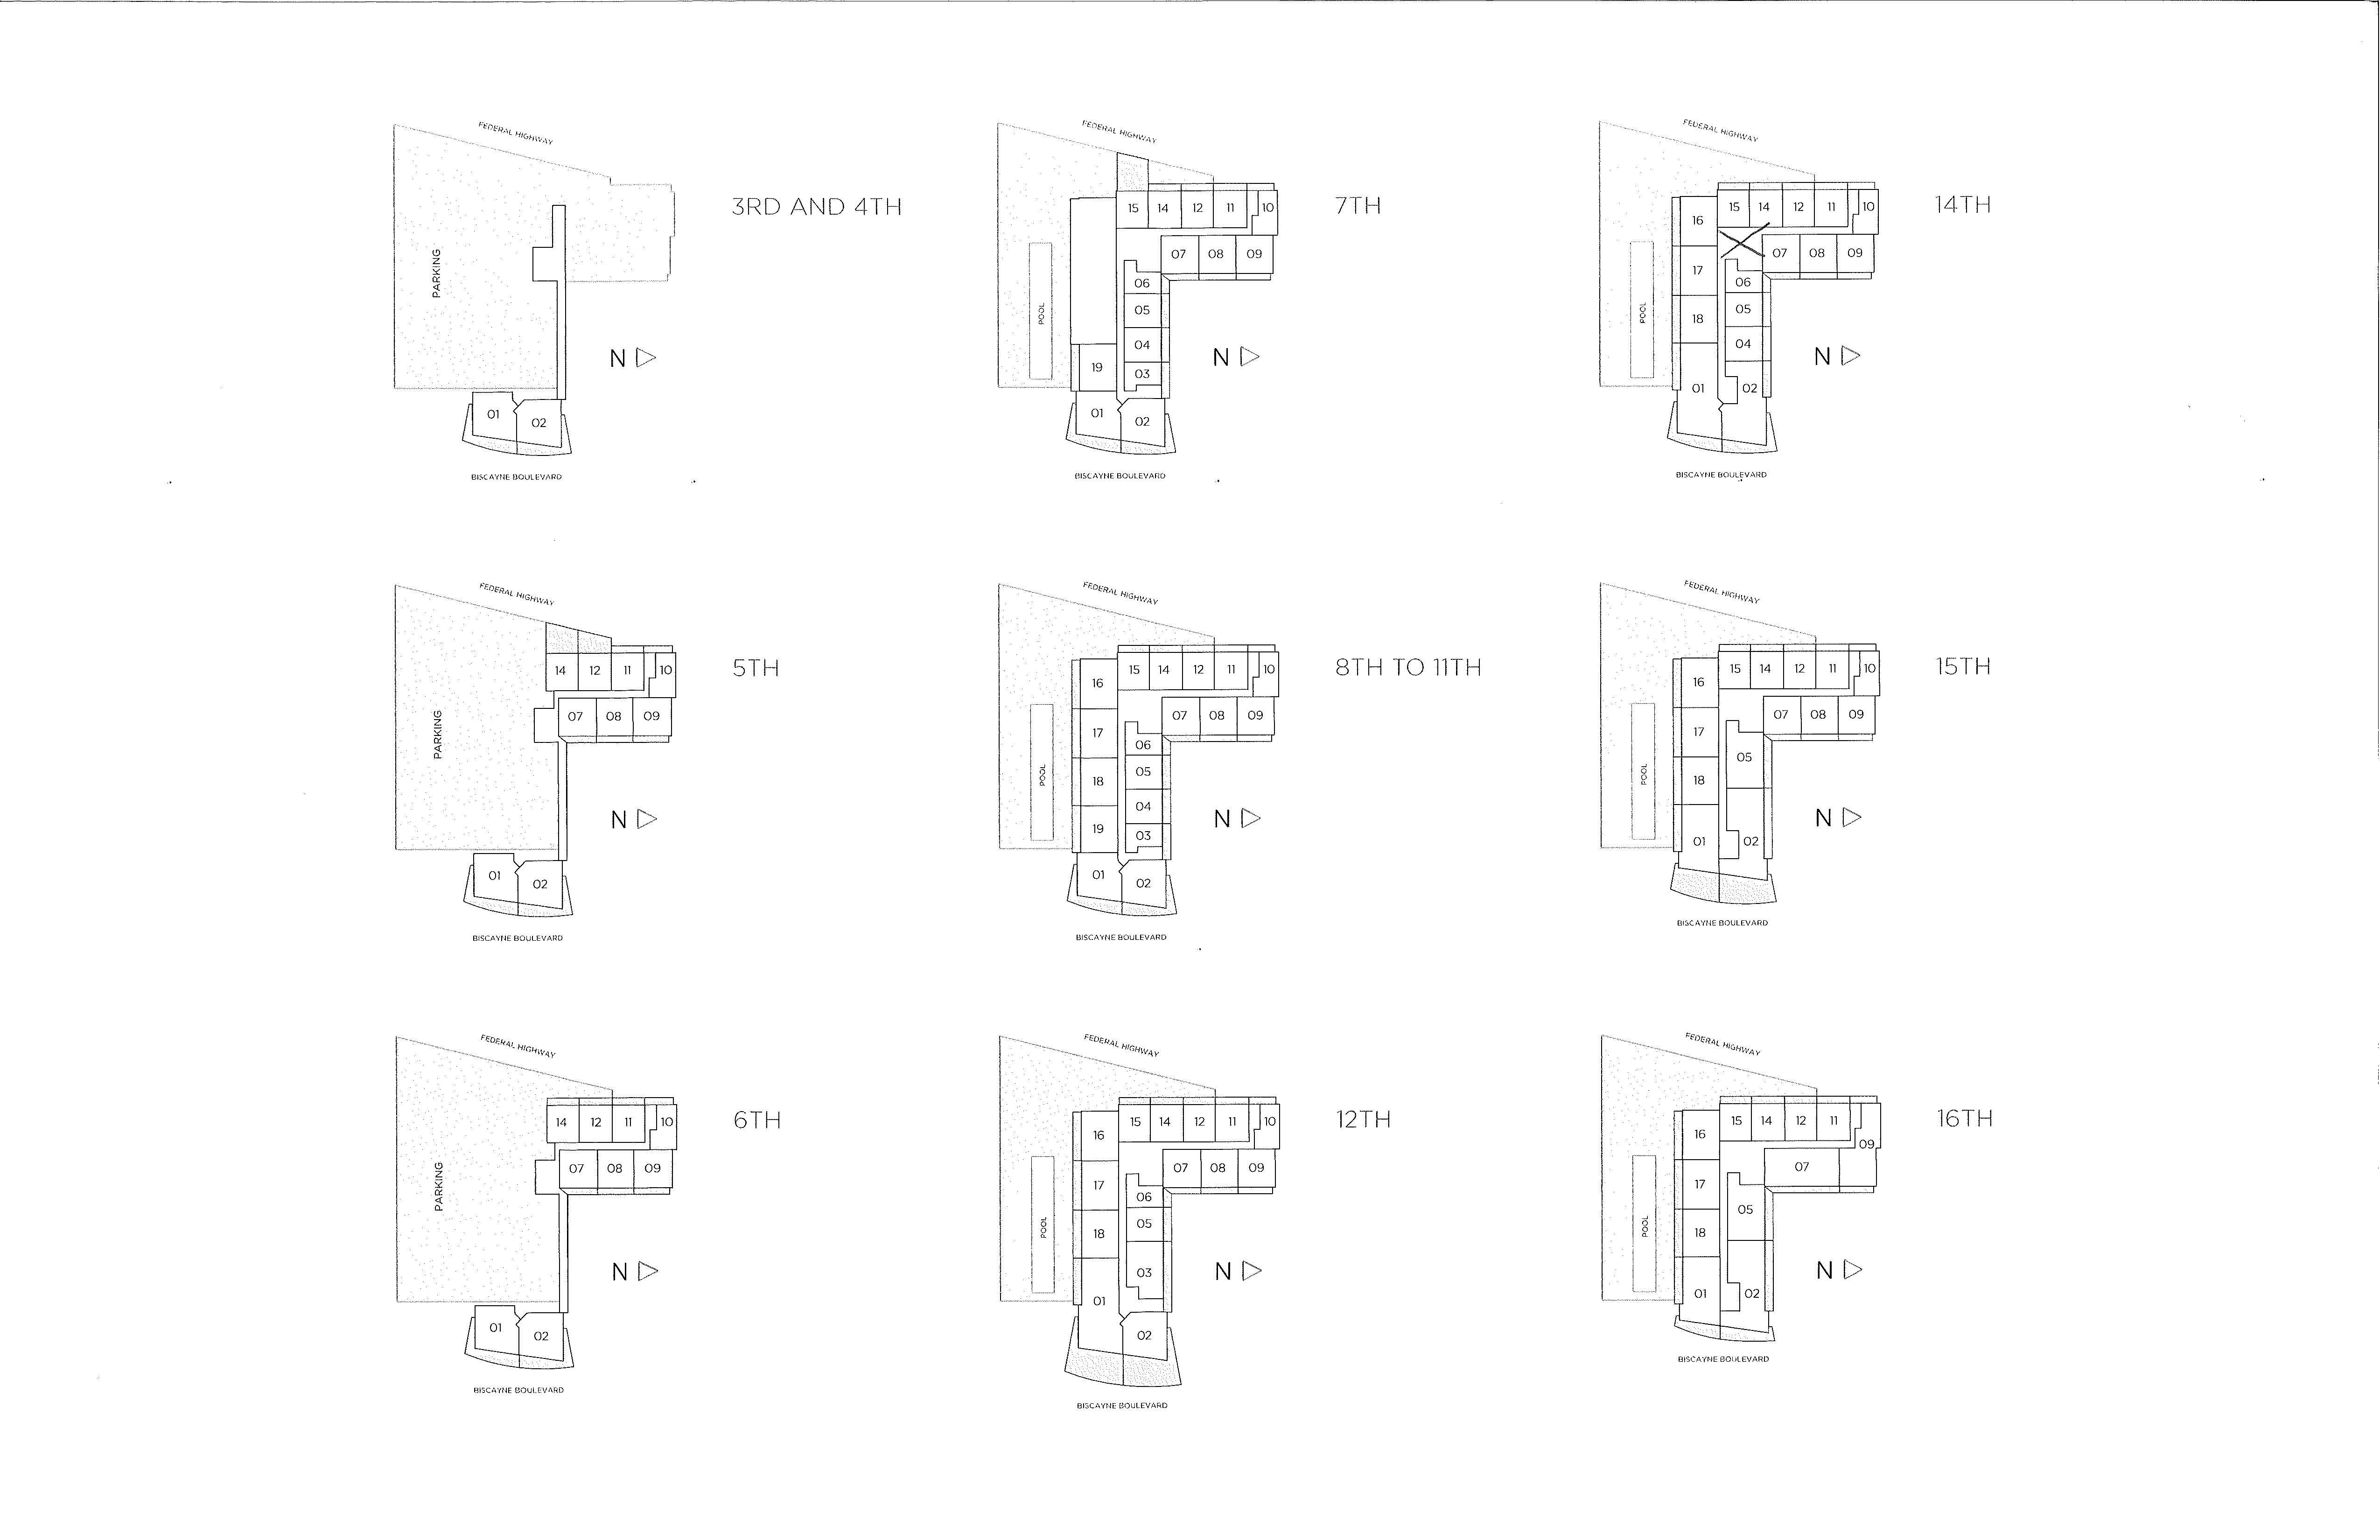 Baltus House Site Plan Floors 7 to 14